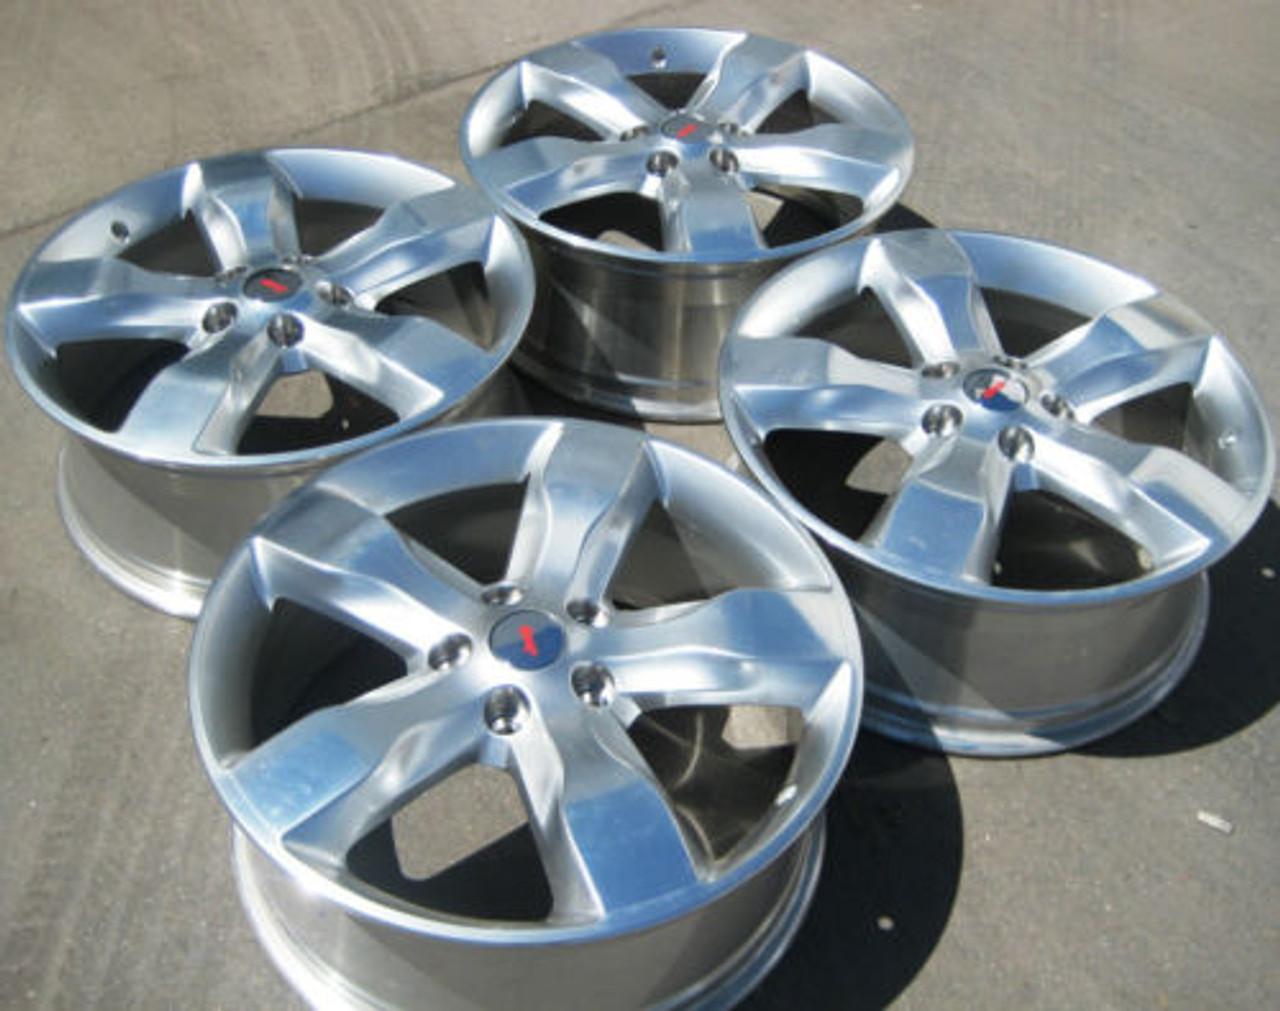 20 Polished Jeep Overland Wheels Grand Cherokee Overland Summit Edit Factory Oem Wheels Set Of 4 20x8 Rims Stock Wheel Solutions